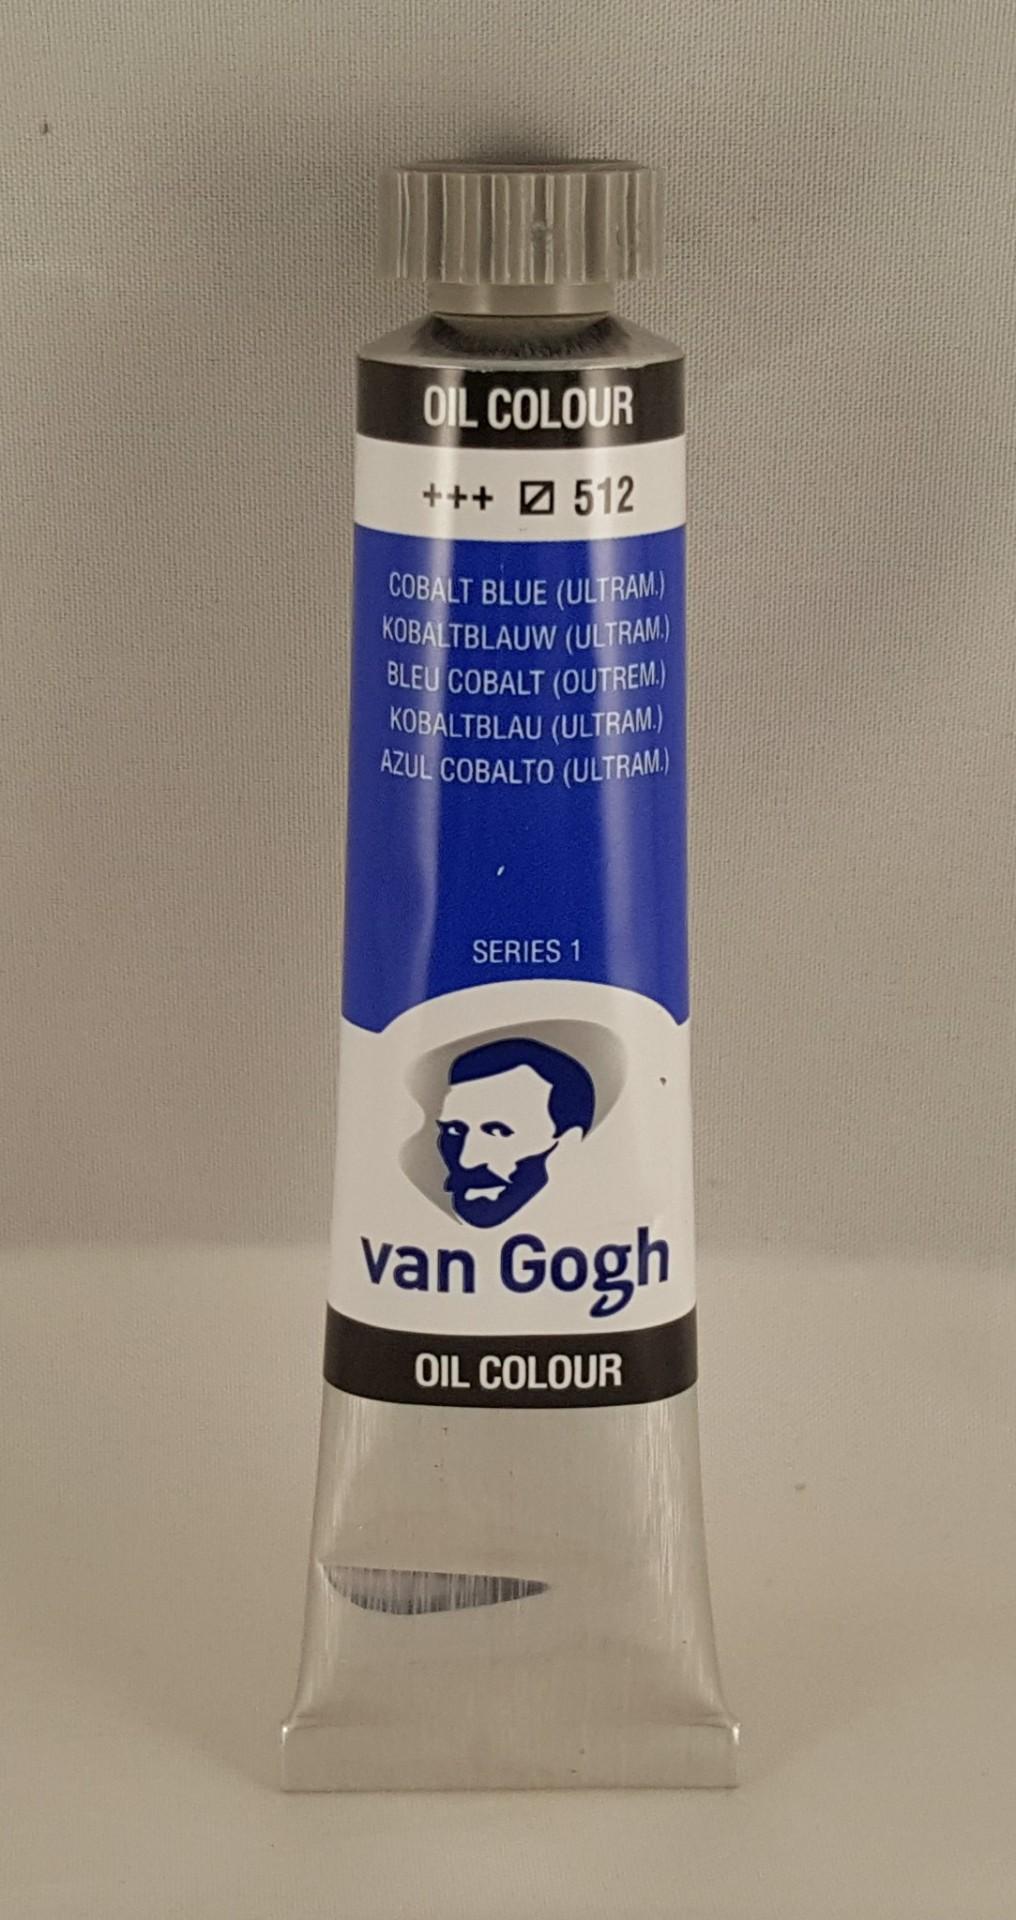 Tinta de óleo Van Gogh cobalt blue (ultram.)